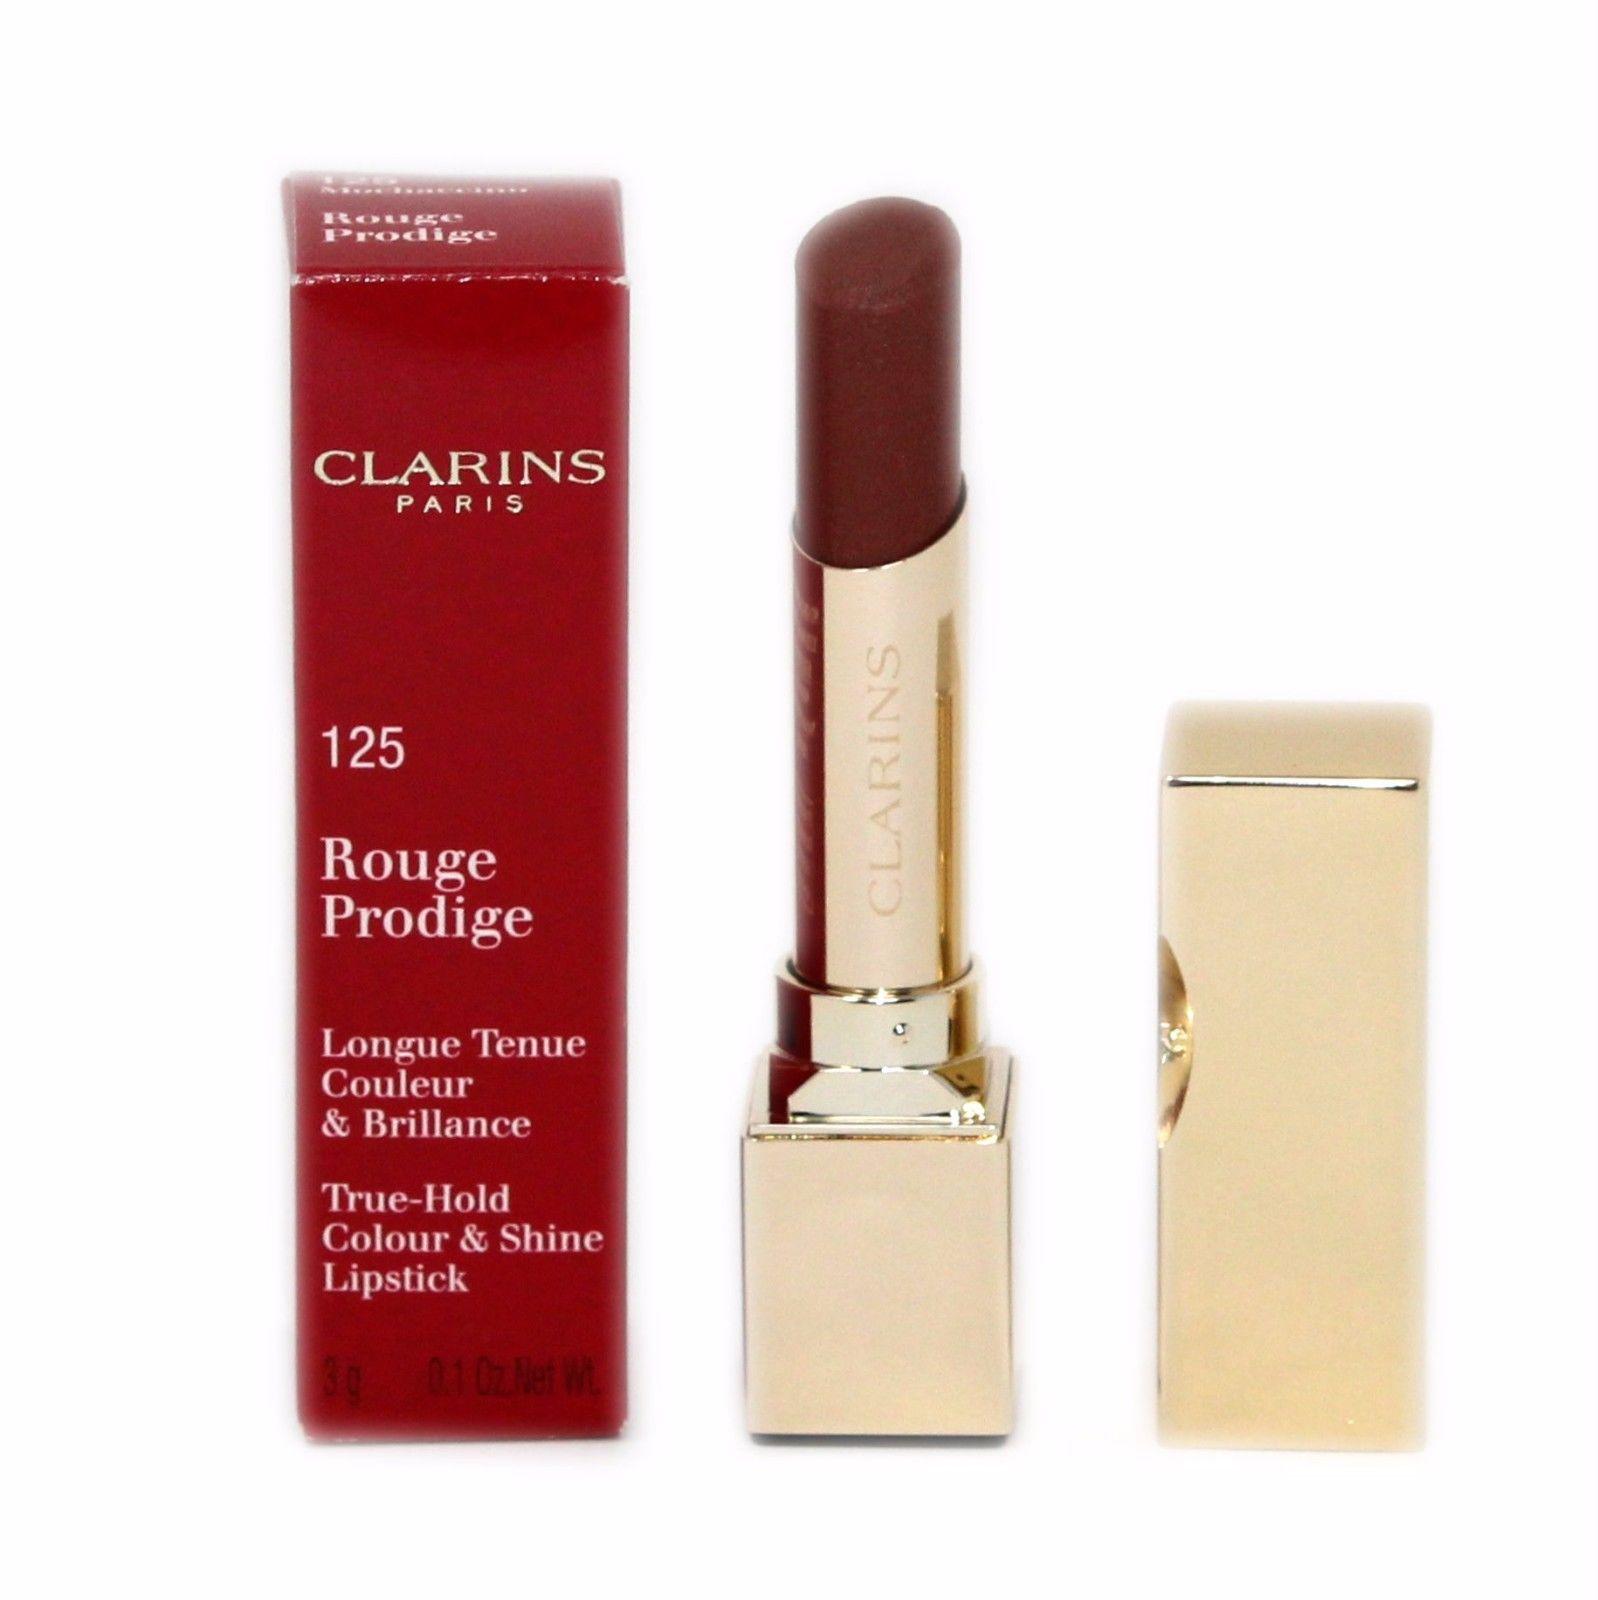 CLARINS ROUGE PRODIGE TRUE-HOLD COLOUR & SHINE LIPSTICK 3G #125 NIB-442051 - $25.74